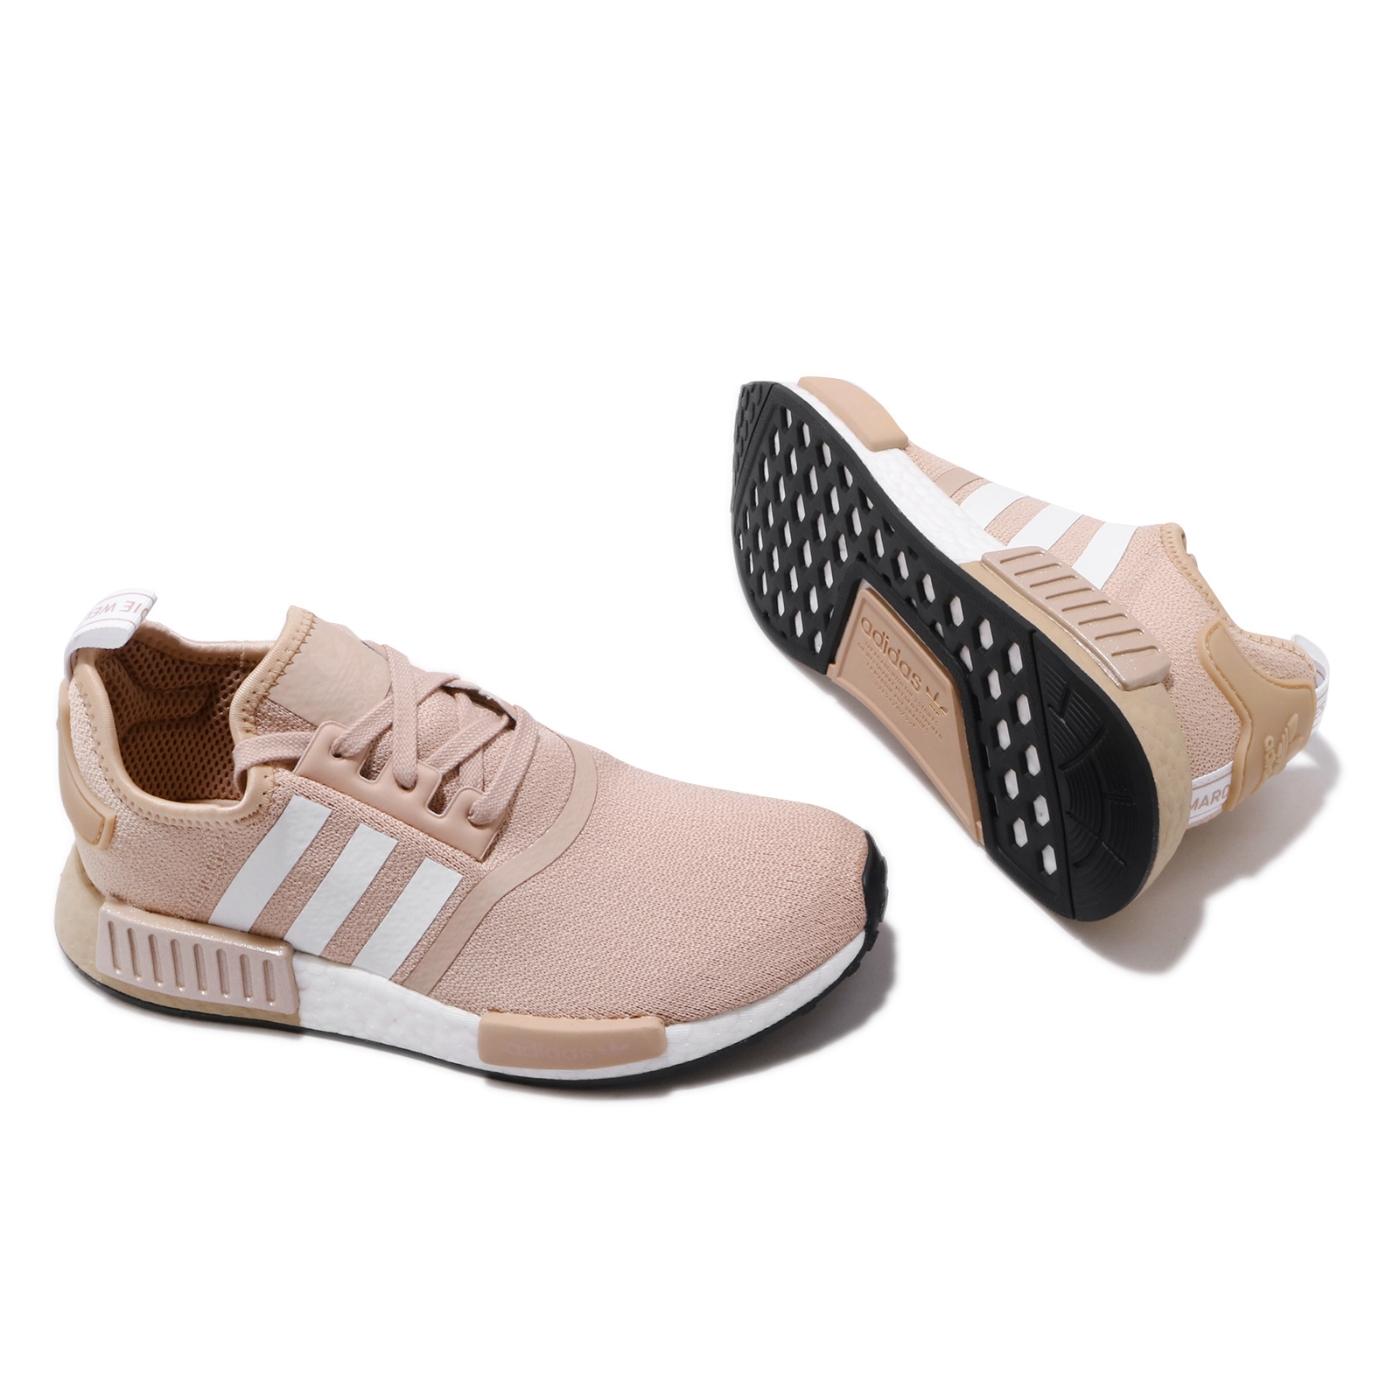 adidas 休閒鞋 NMD R1 襪套式 女鞋 海外限定 愛迪達 三葉草 流行穿搭 黃褐 白 FV2474